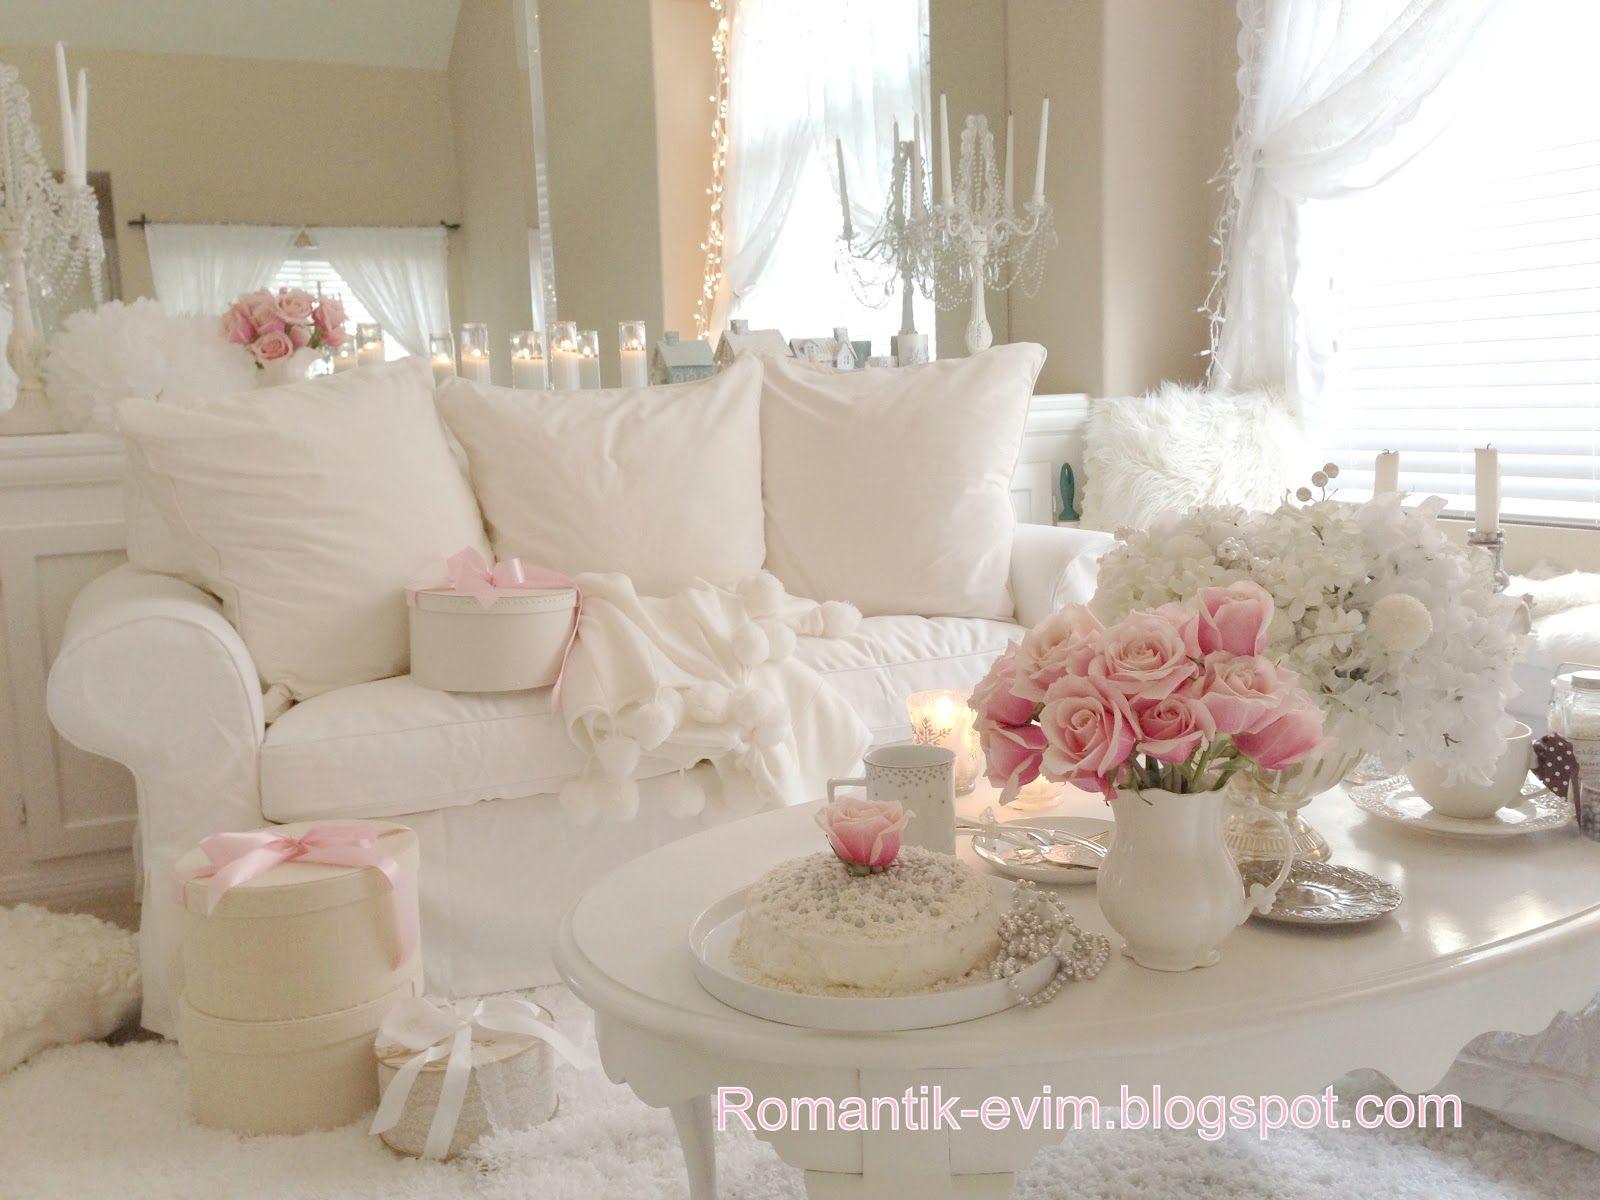 Romantic shabby chic home romantic shabby chic blog - Romantic Shabby Chic Decorating Ideas Romantic Shabby Chic Blog Romantic Shabby Chic Home Romantic